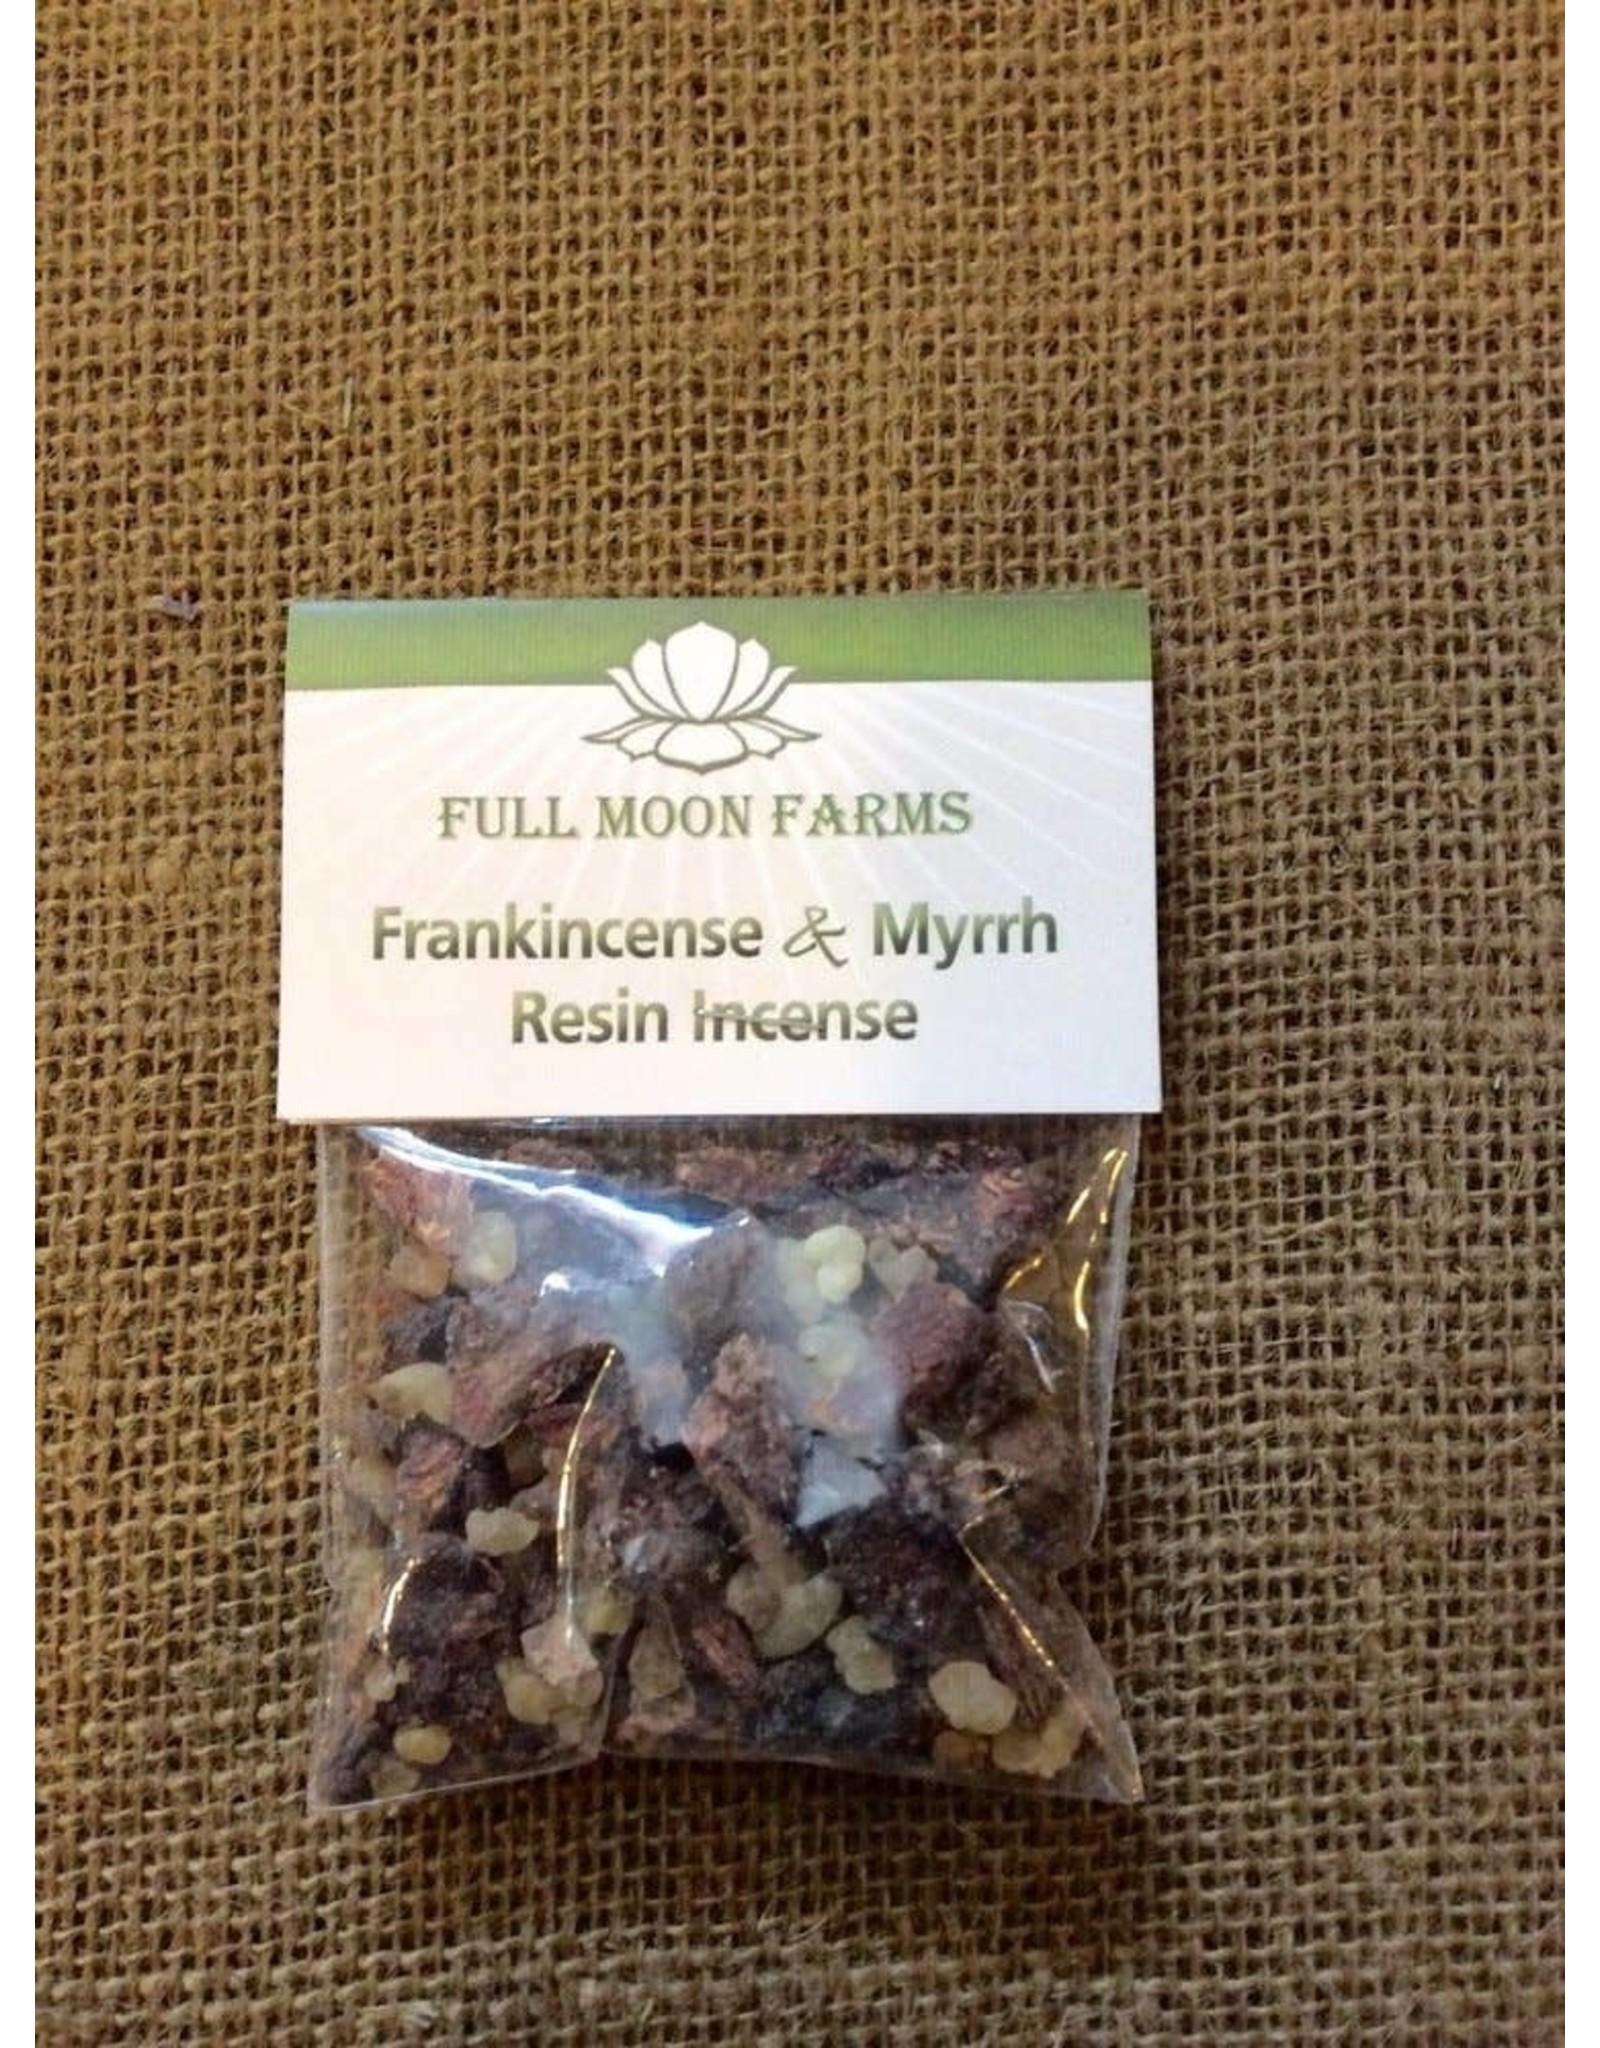 Full Moons Farms Resin Incense | Frankincense & Myrrh